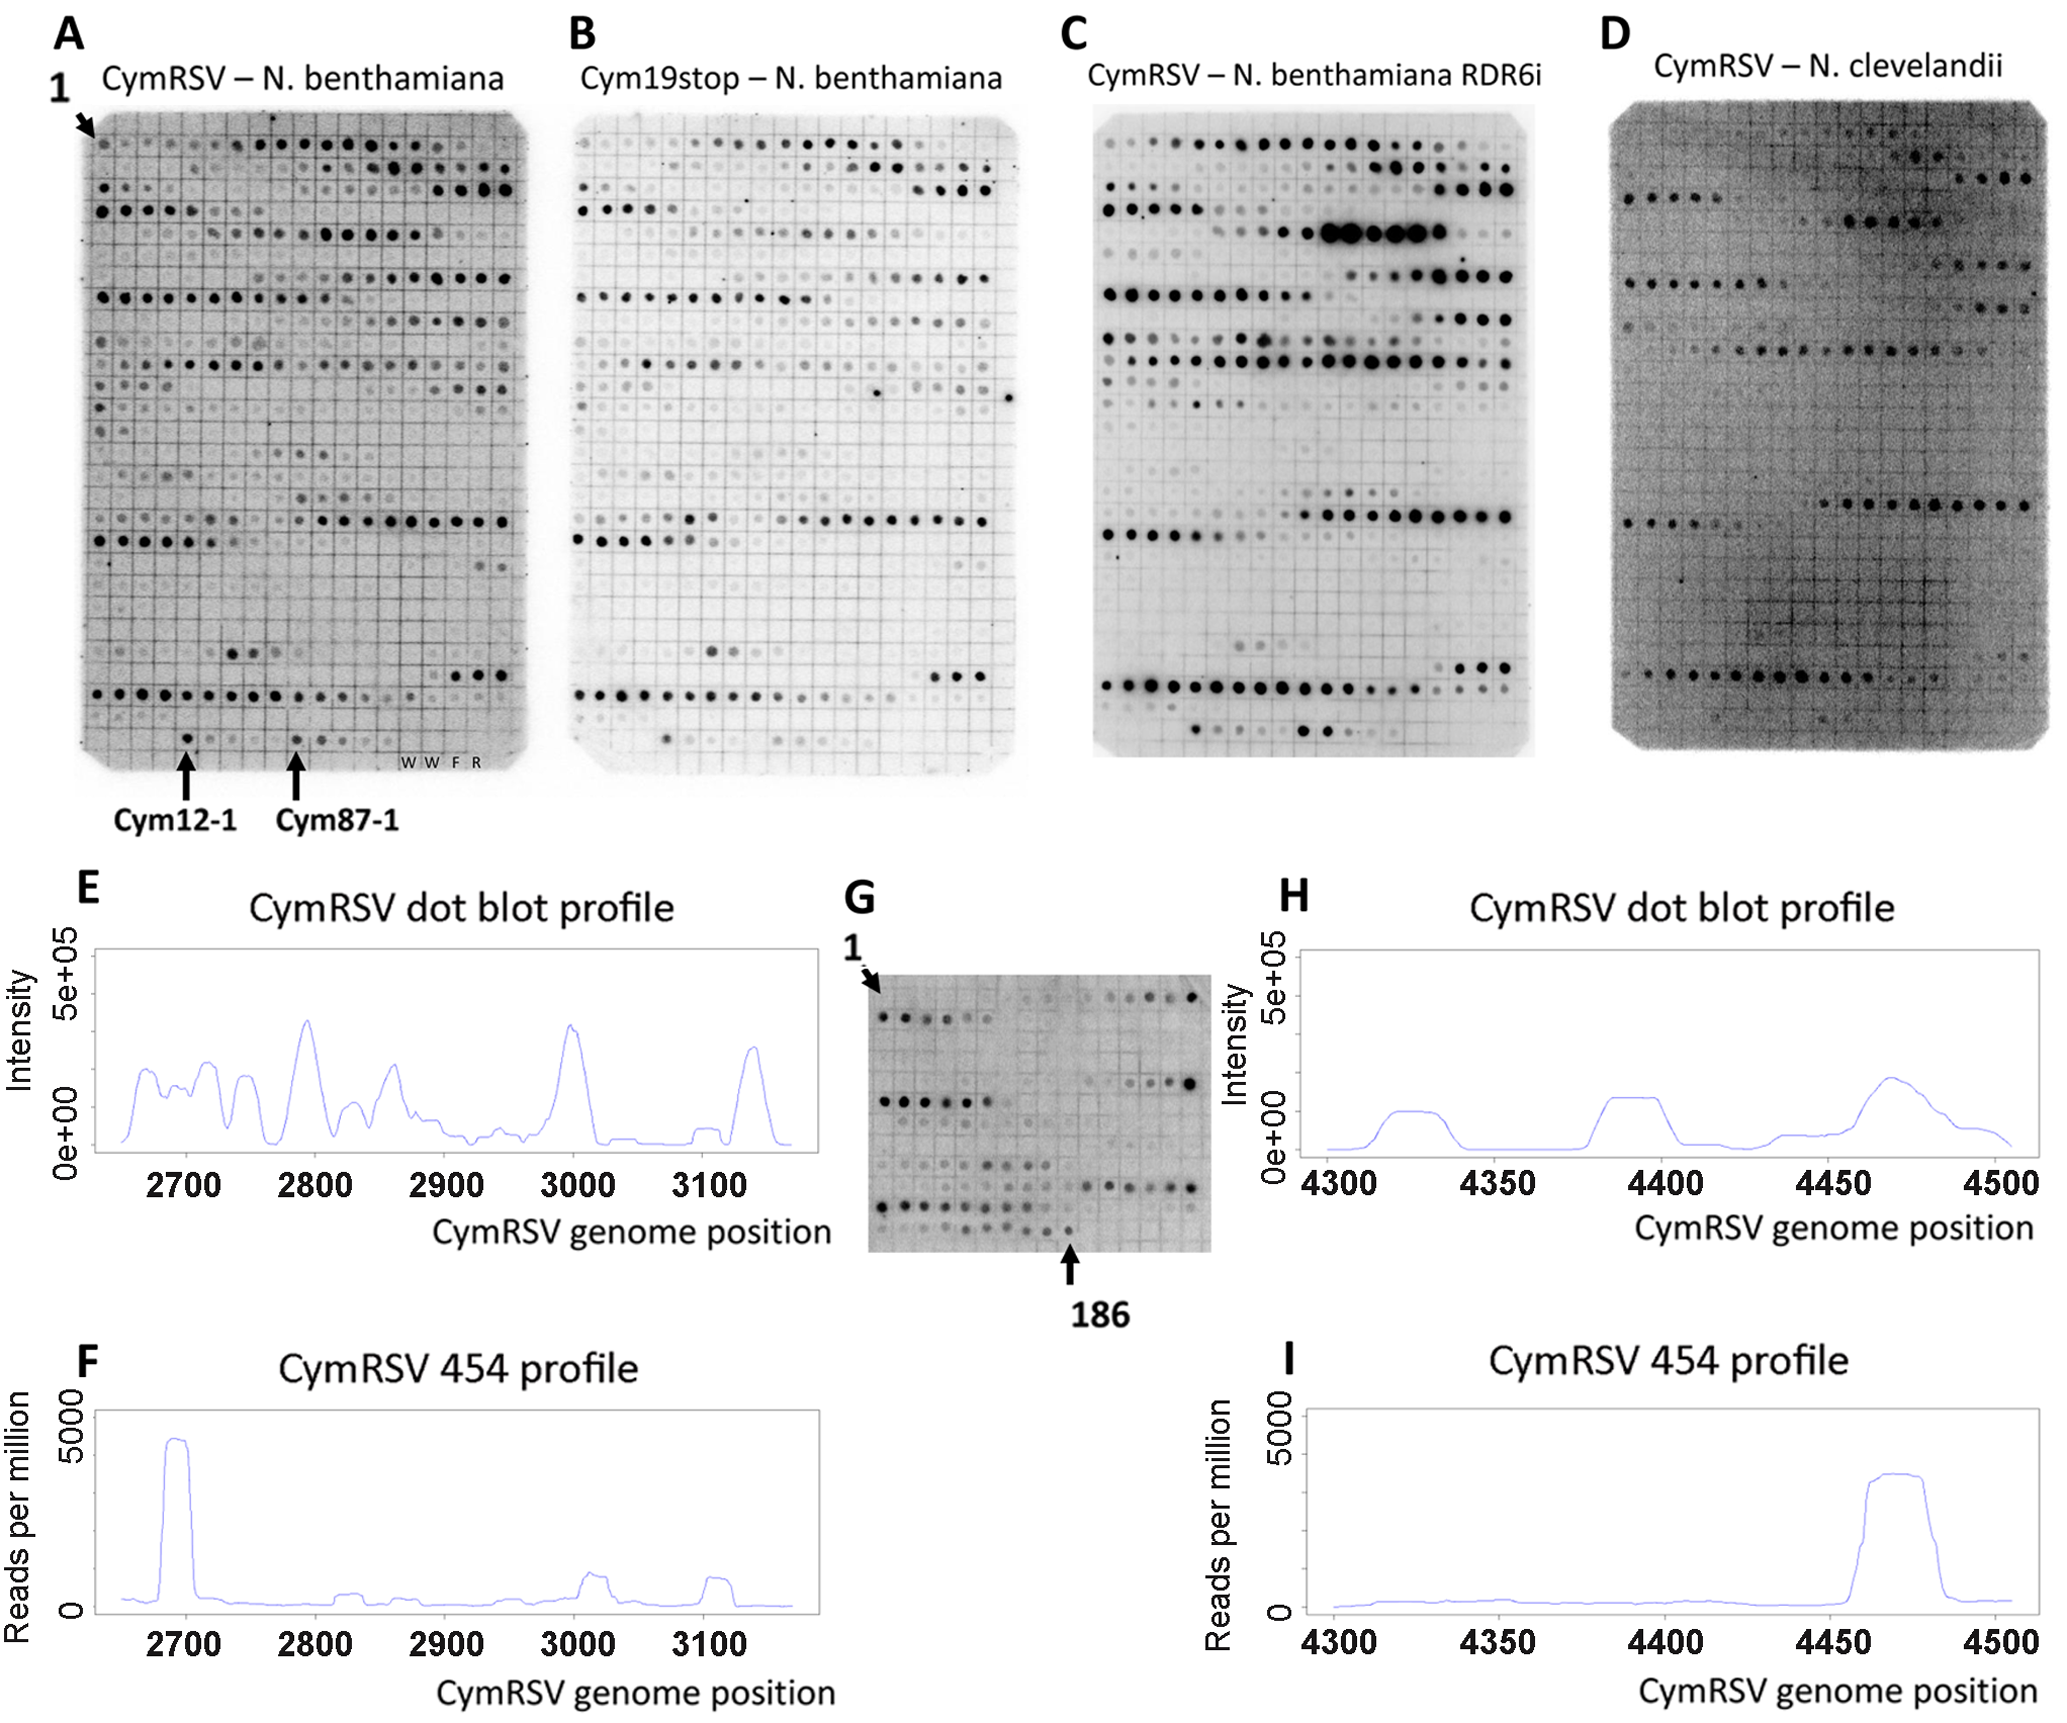 Dot blot and 454 profile of vsiRNAs.